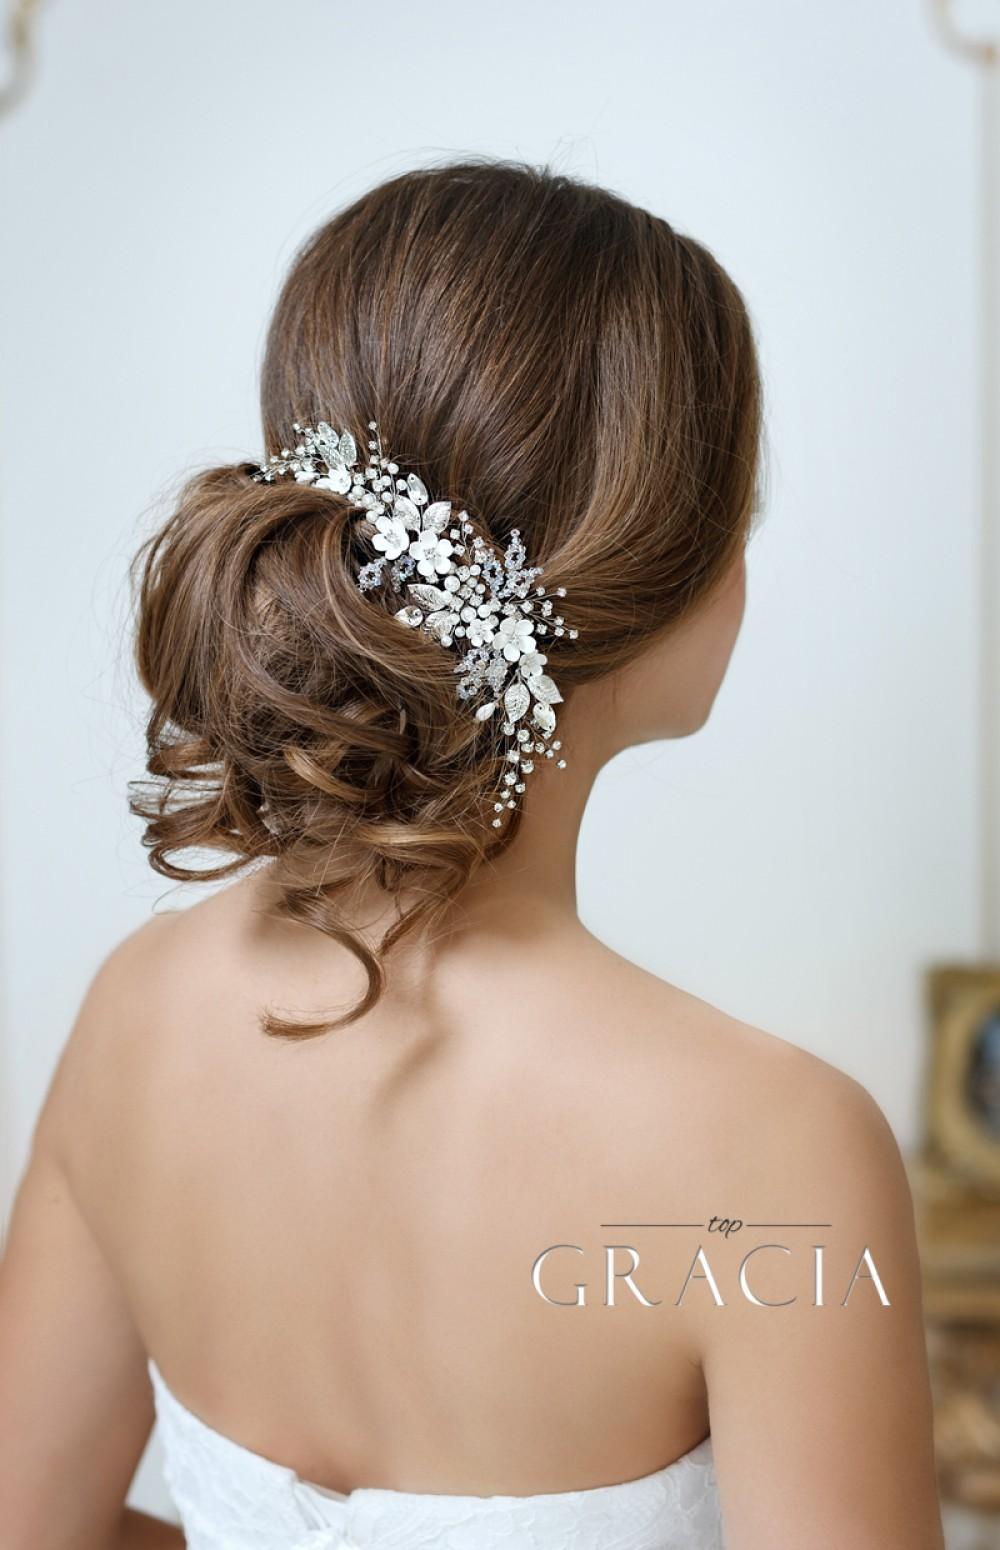 Bridal Headbands Topgracia Handmade Bridesmaid Bridal Hair